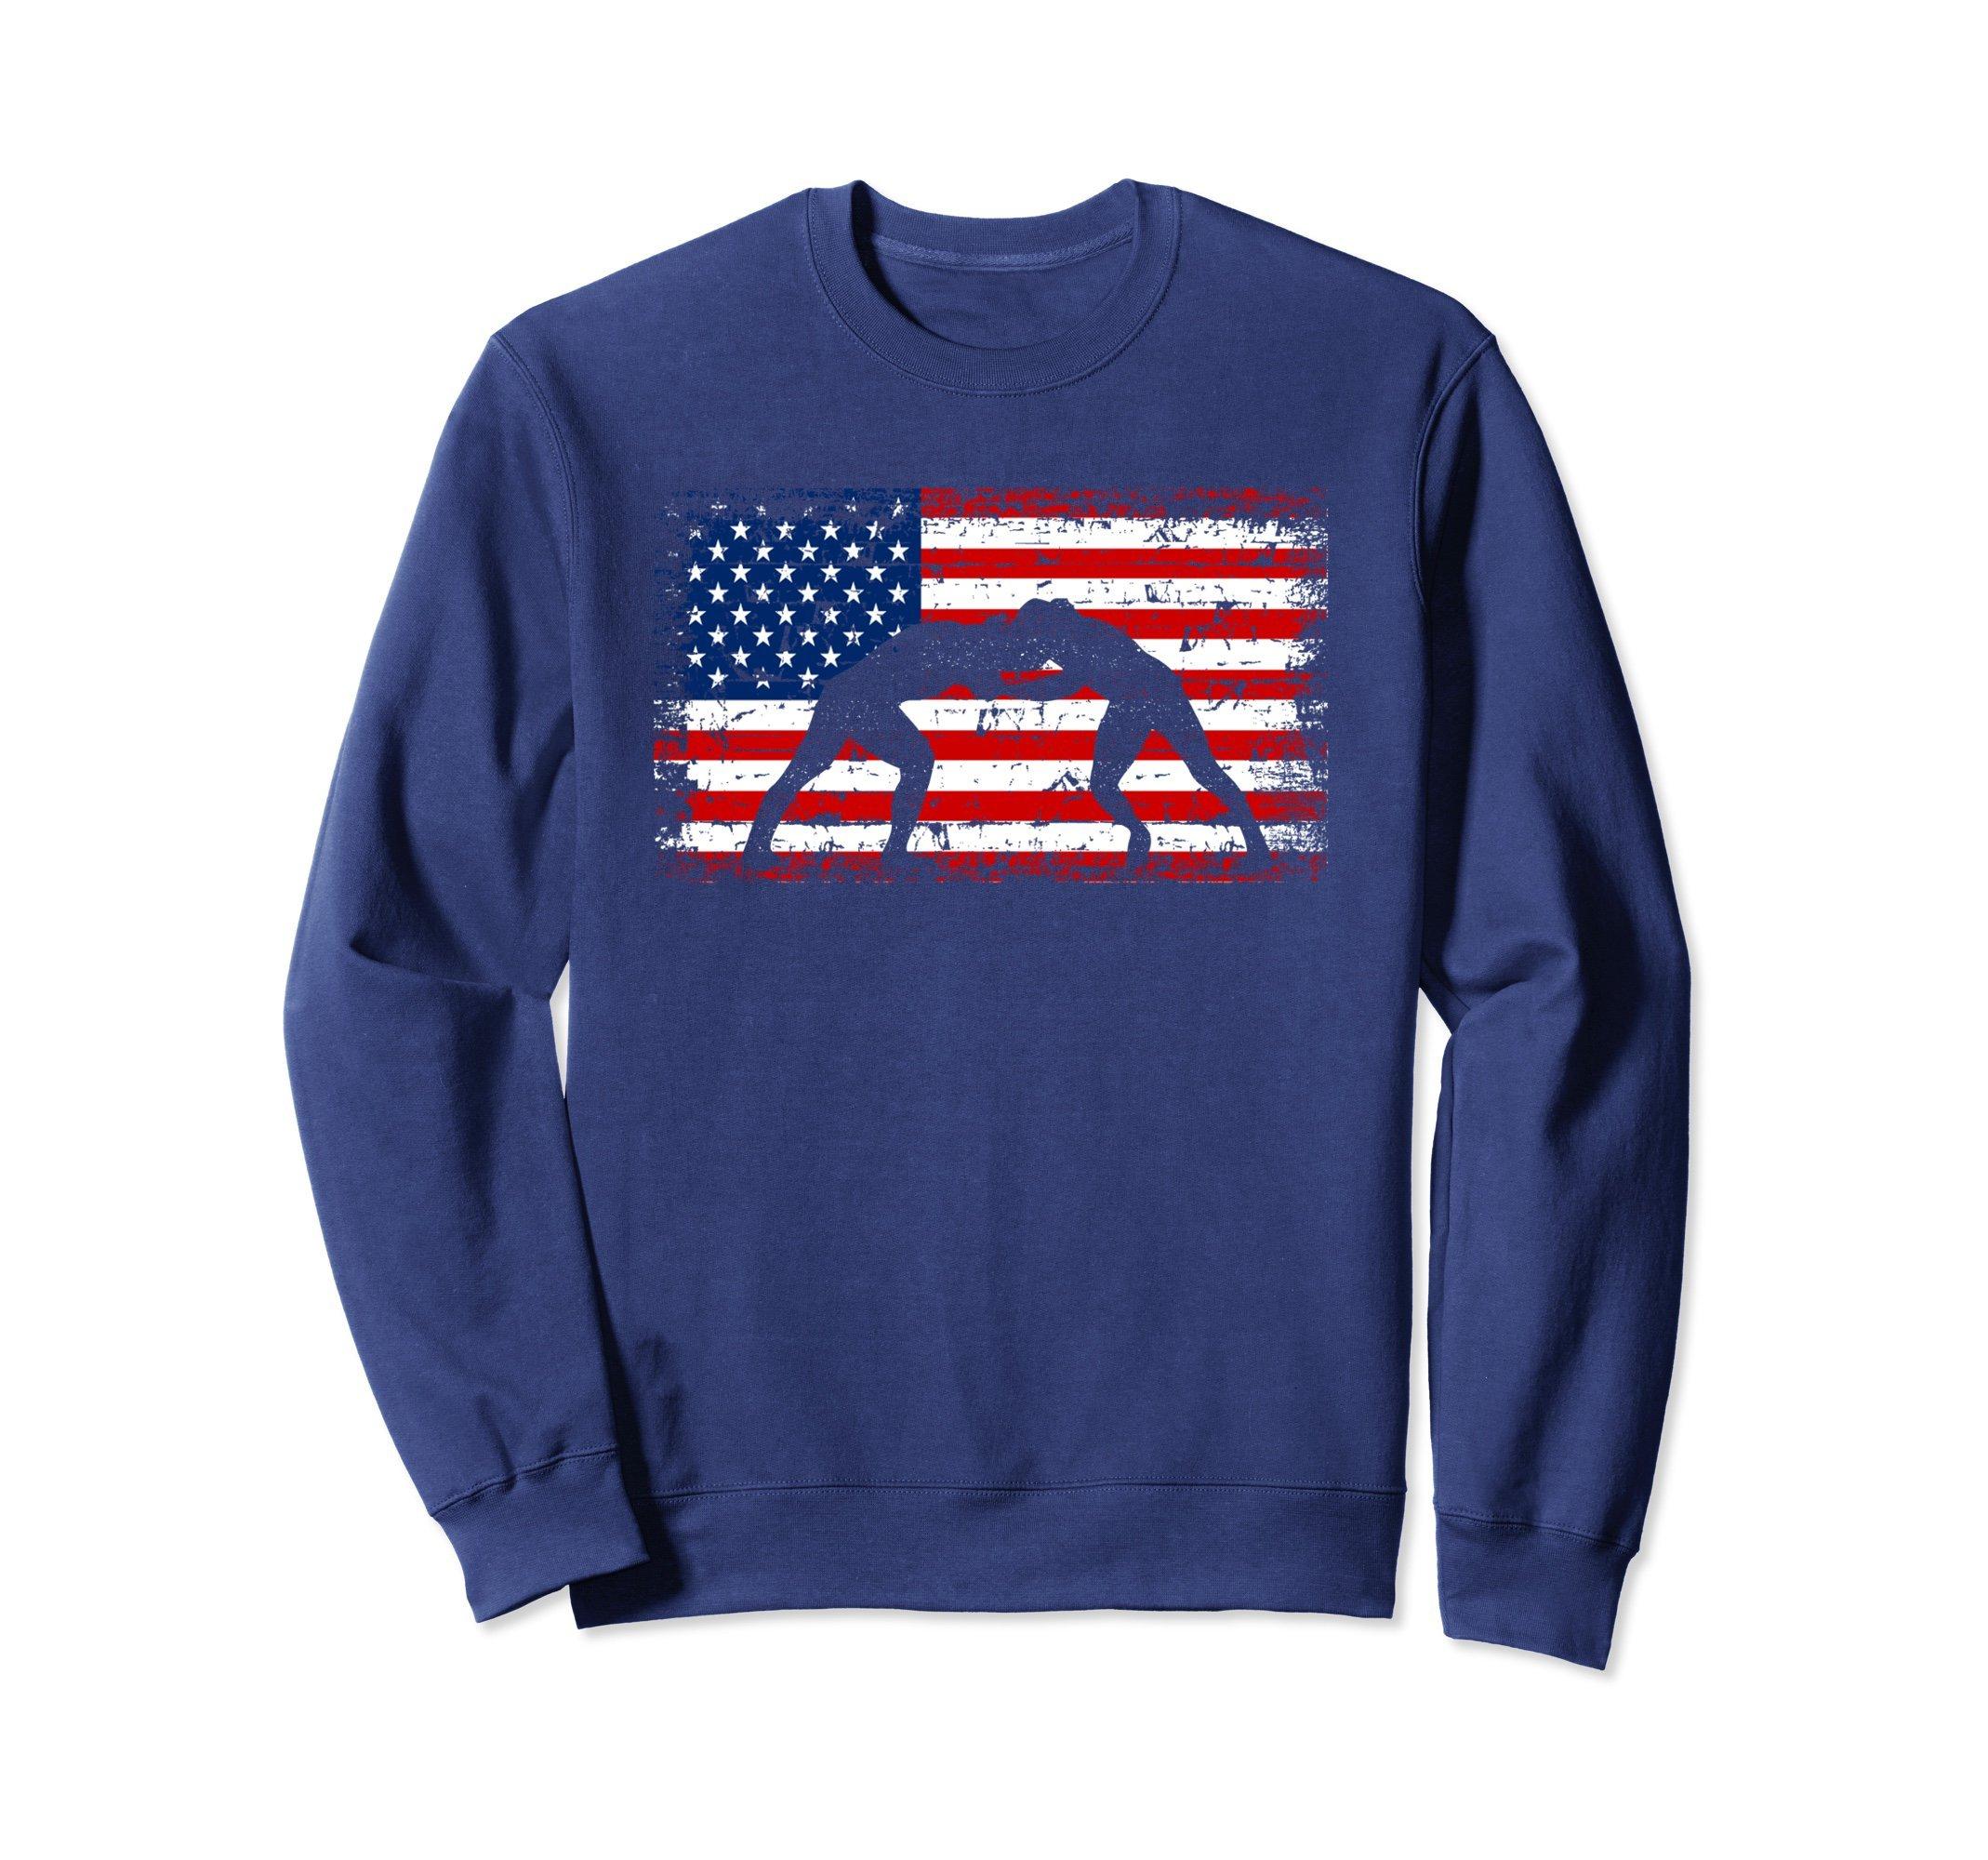 Unisex Wrestling American flag Wrestlers Sweatshirt XL: Navy by Crea8tive Wrestling Dezines